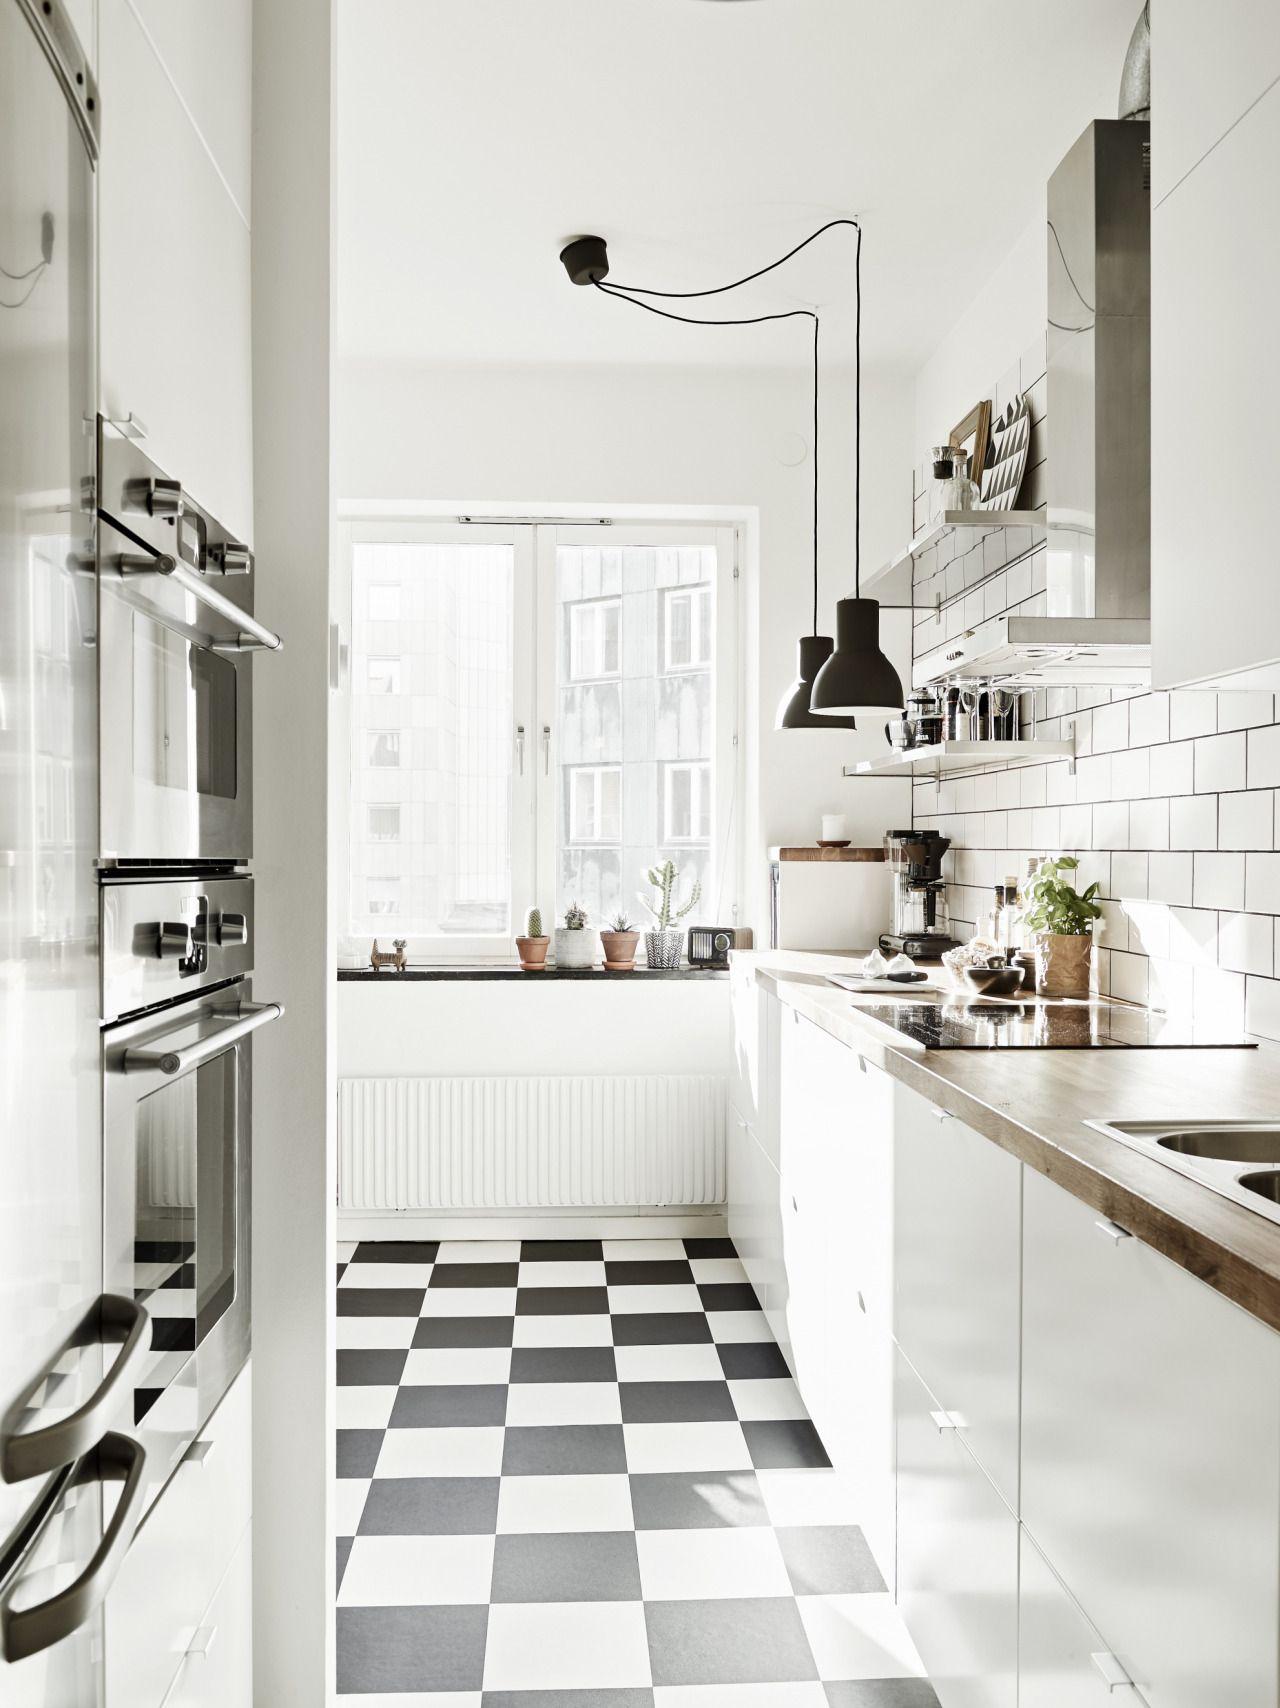 Modern Luminous Kitchen Via Stadshem My Ideal Home White Kitchen Floor Kitchen Flooring Kitchen Interior